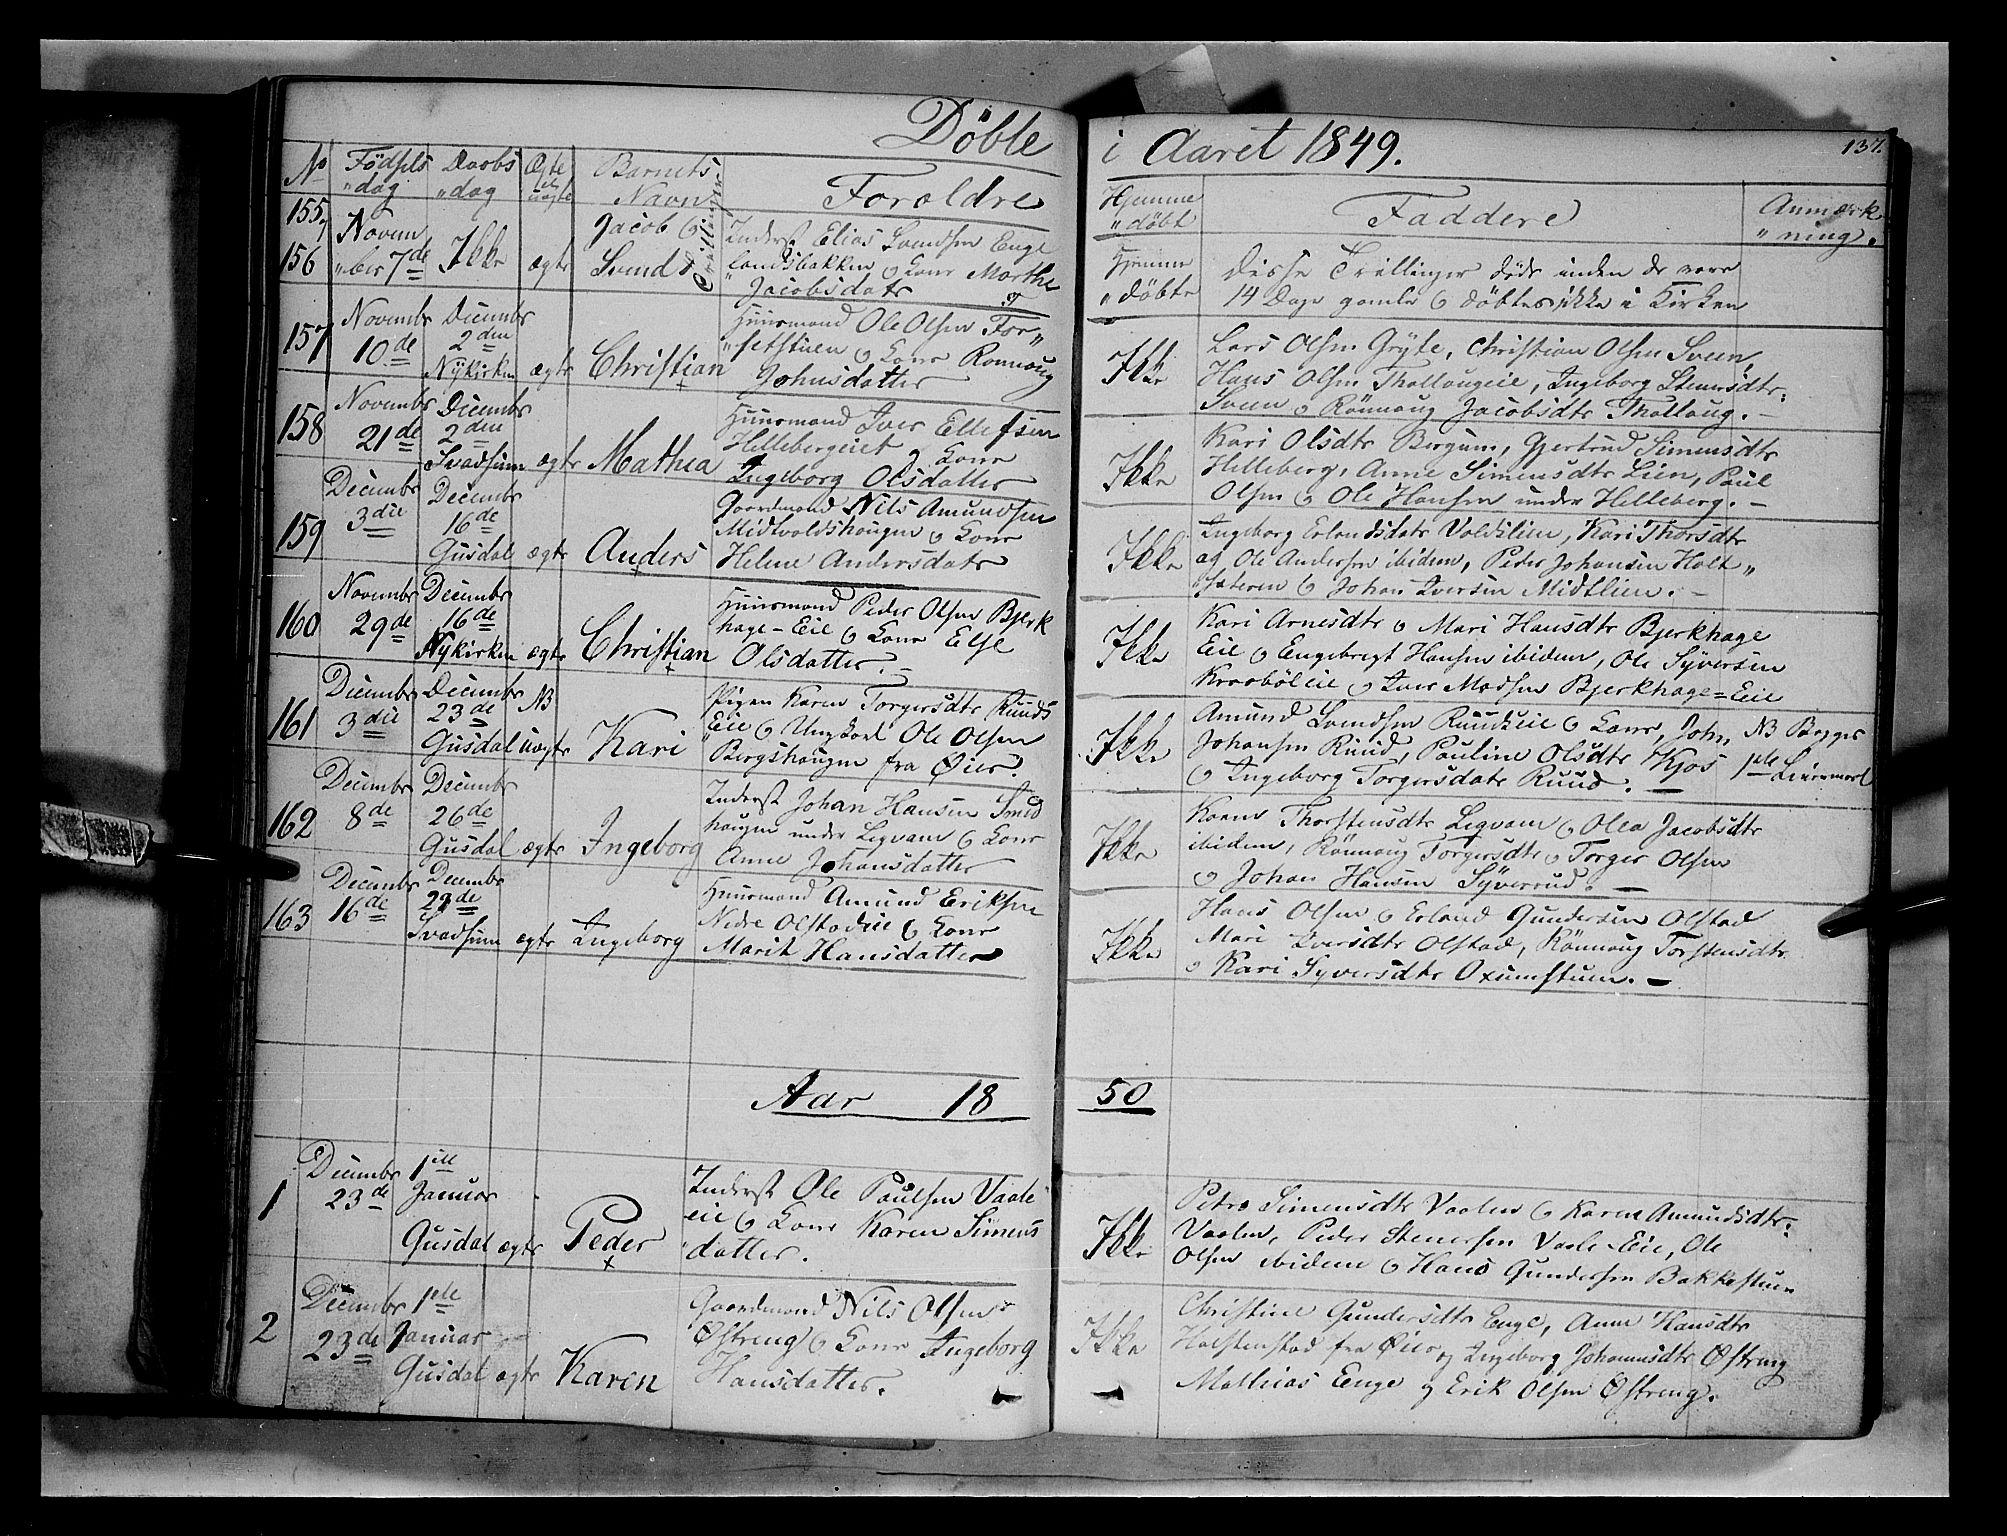 SAH, Gausdal prestekontor, Ministerialbok nr. 7, 1840-1850, s. 137